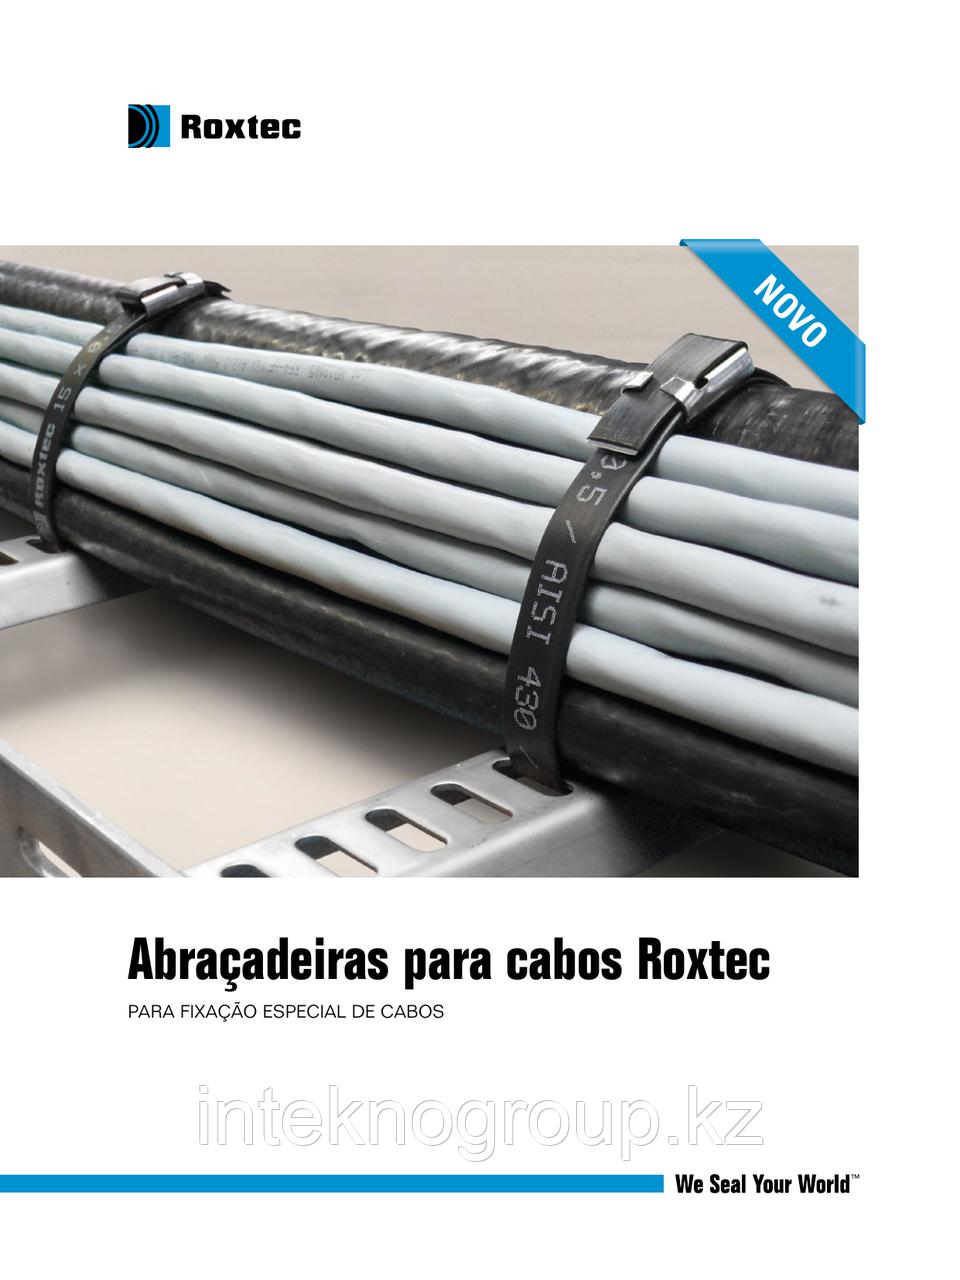 Roxtec Cable straps Strap 15x0,5 grey/galv. L=300 mm